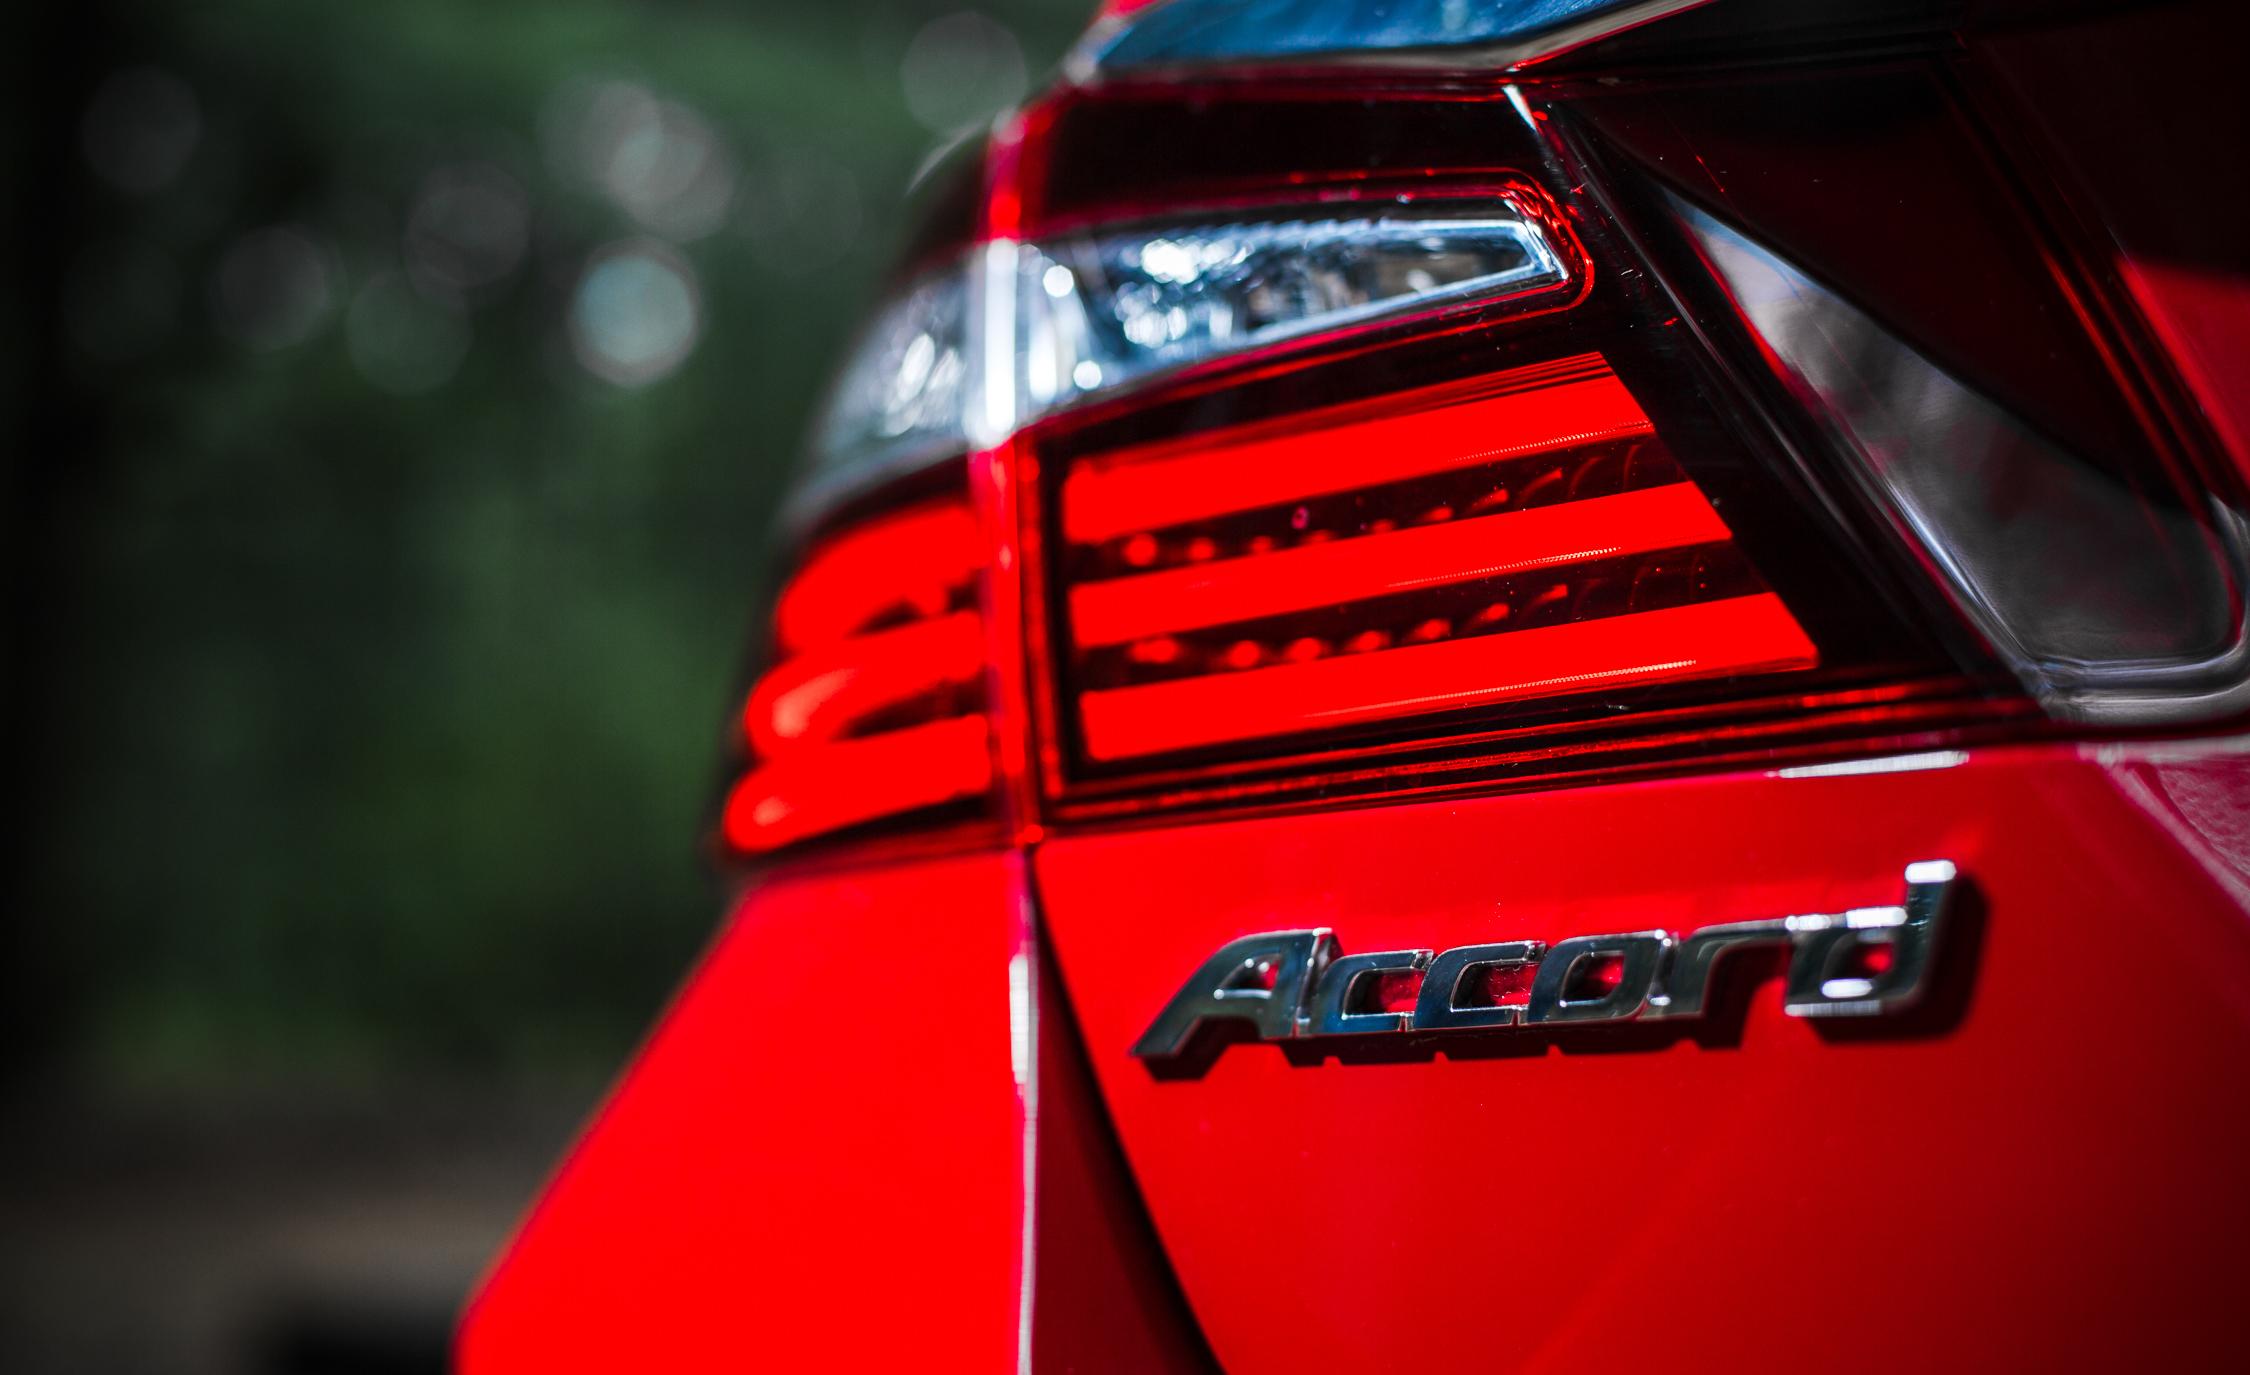 2016 Honda Accord Sport Exterior Badge Rear